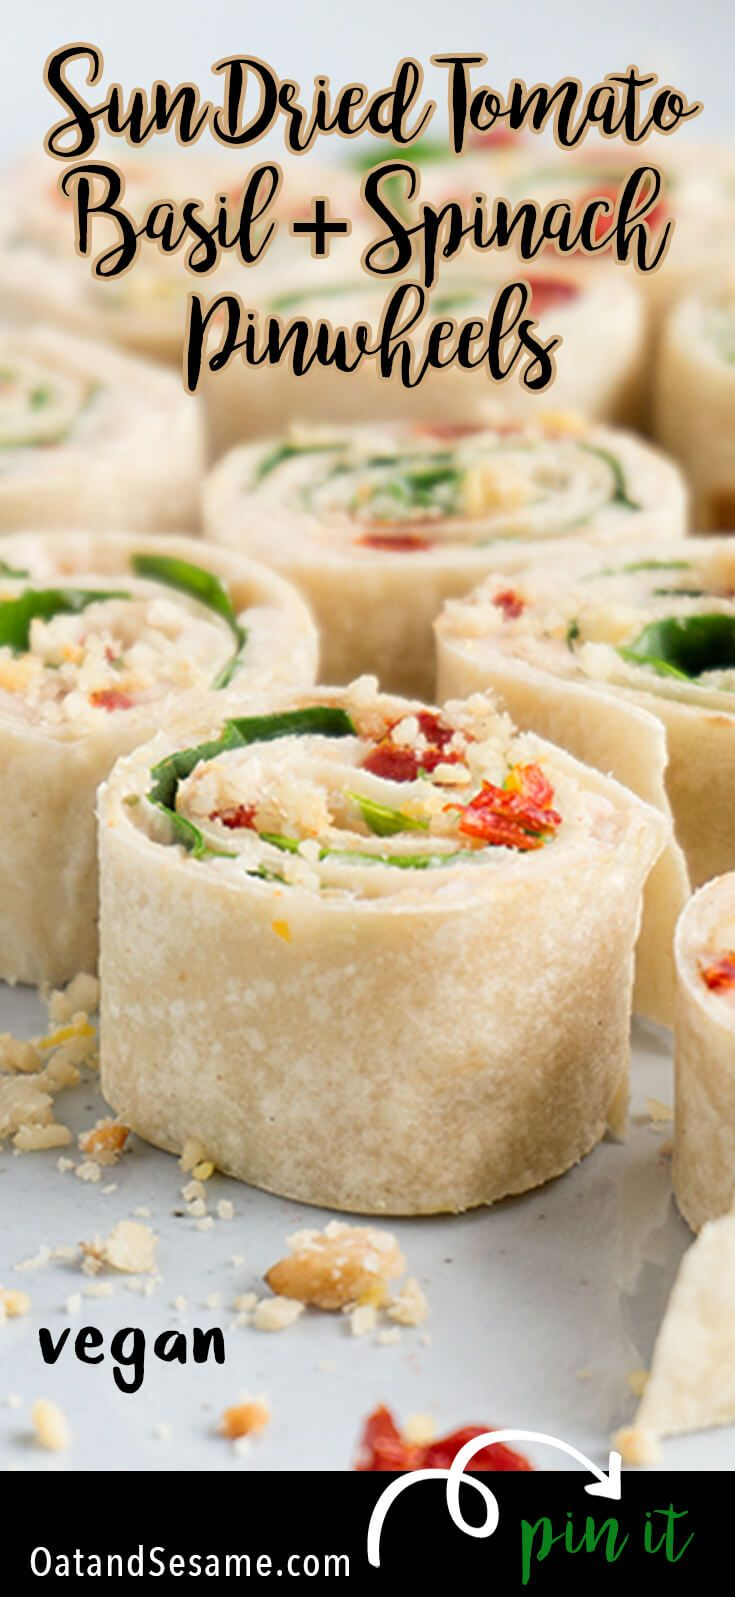 23 vegetarian recipes appetizers ideas